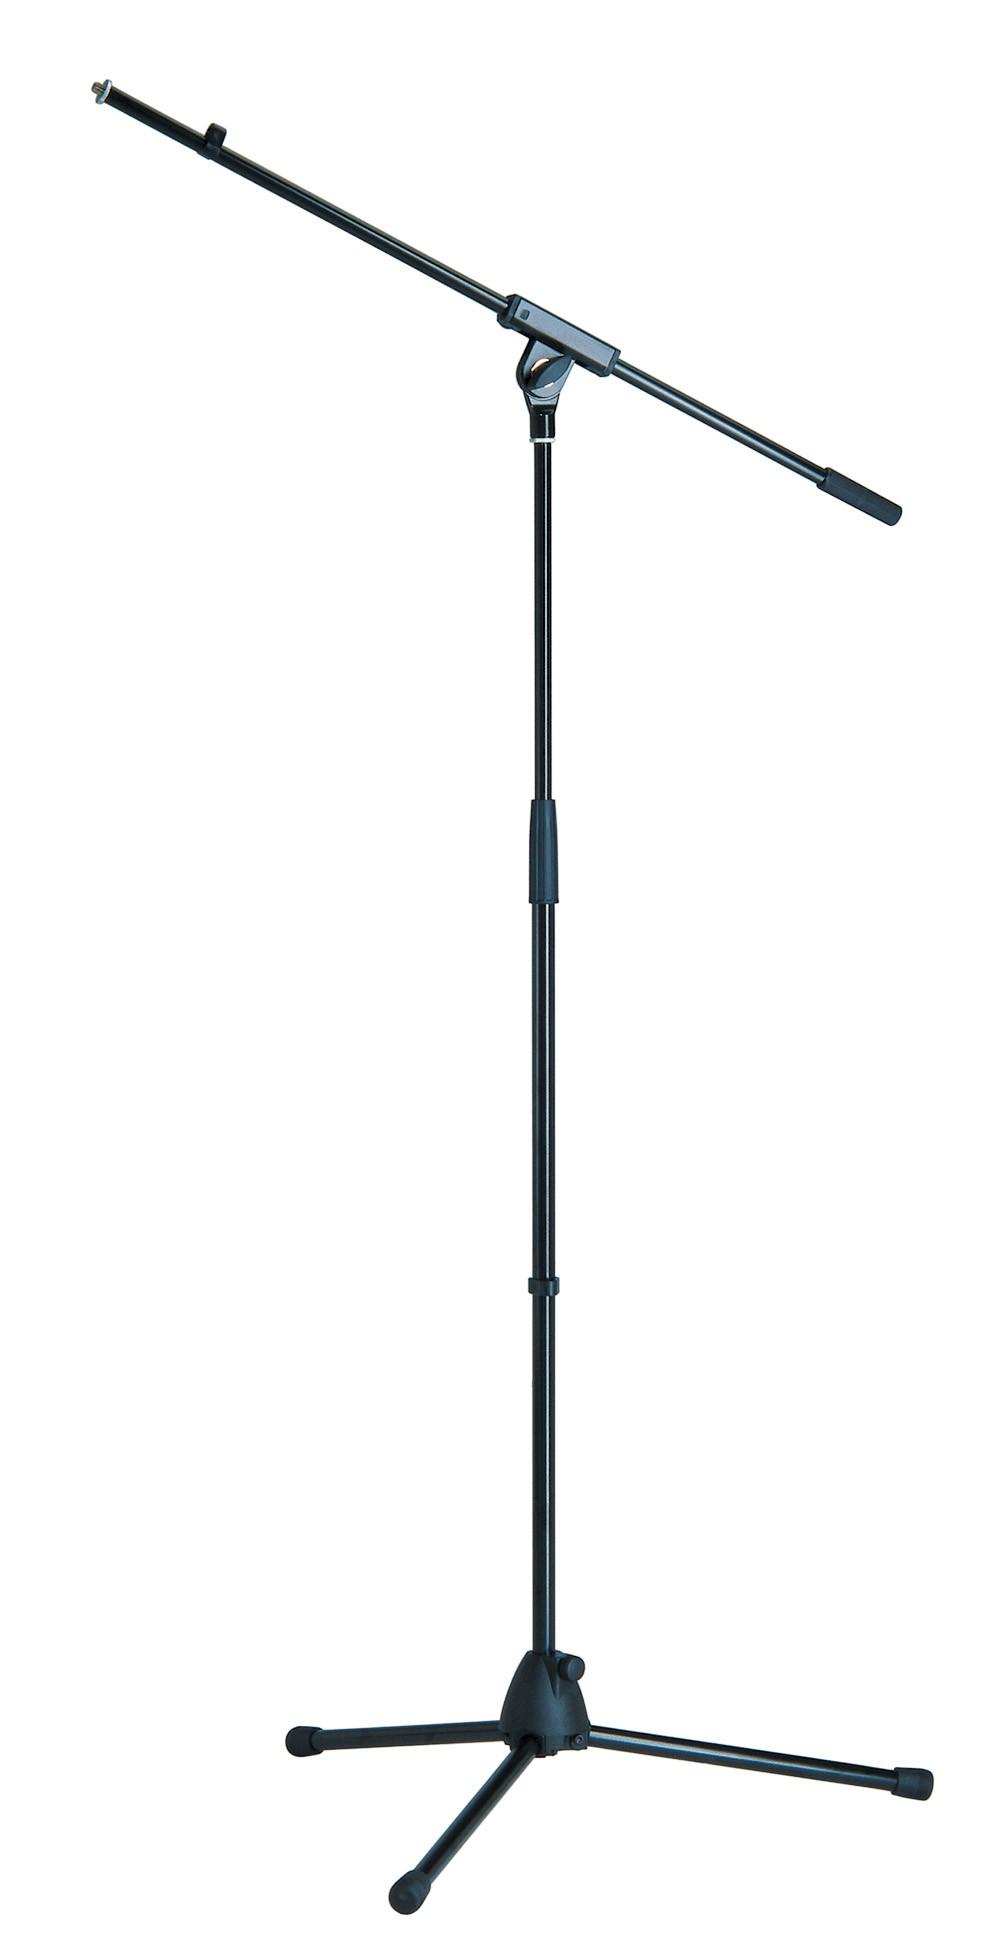 Konig & Meyer 27105 Microphone Stand